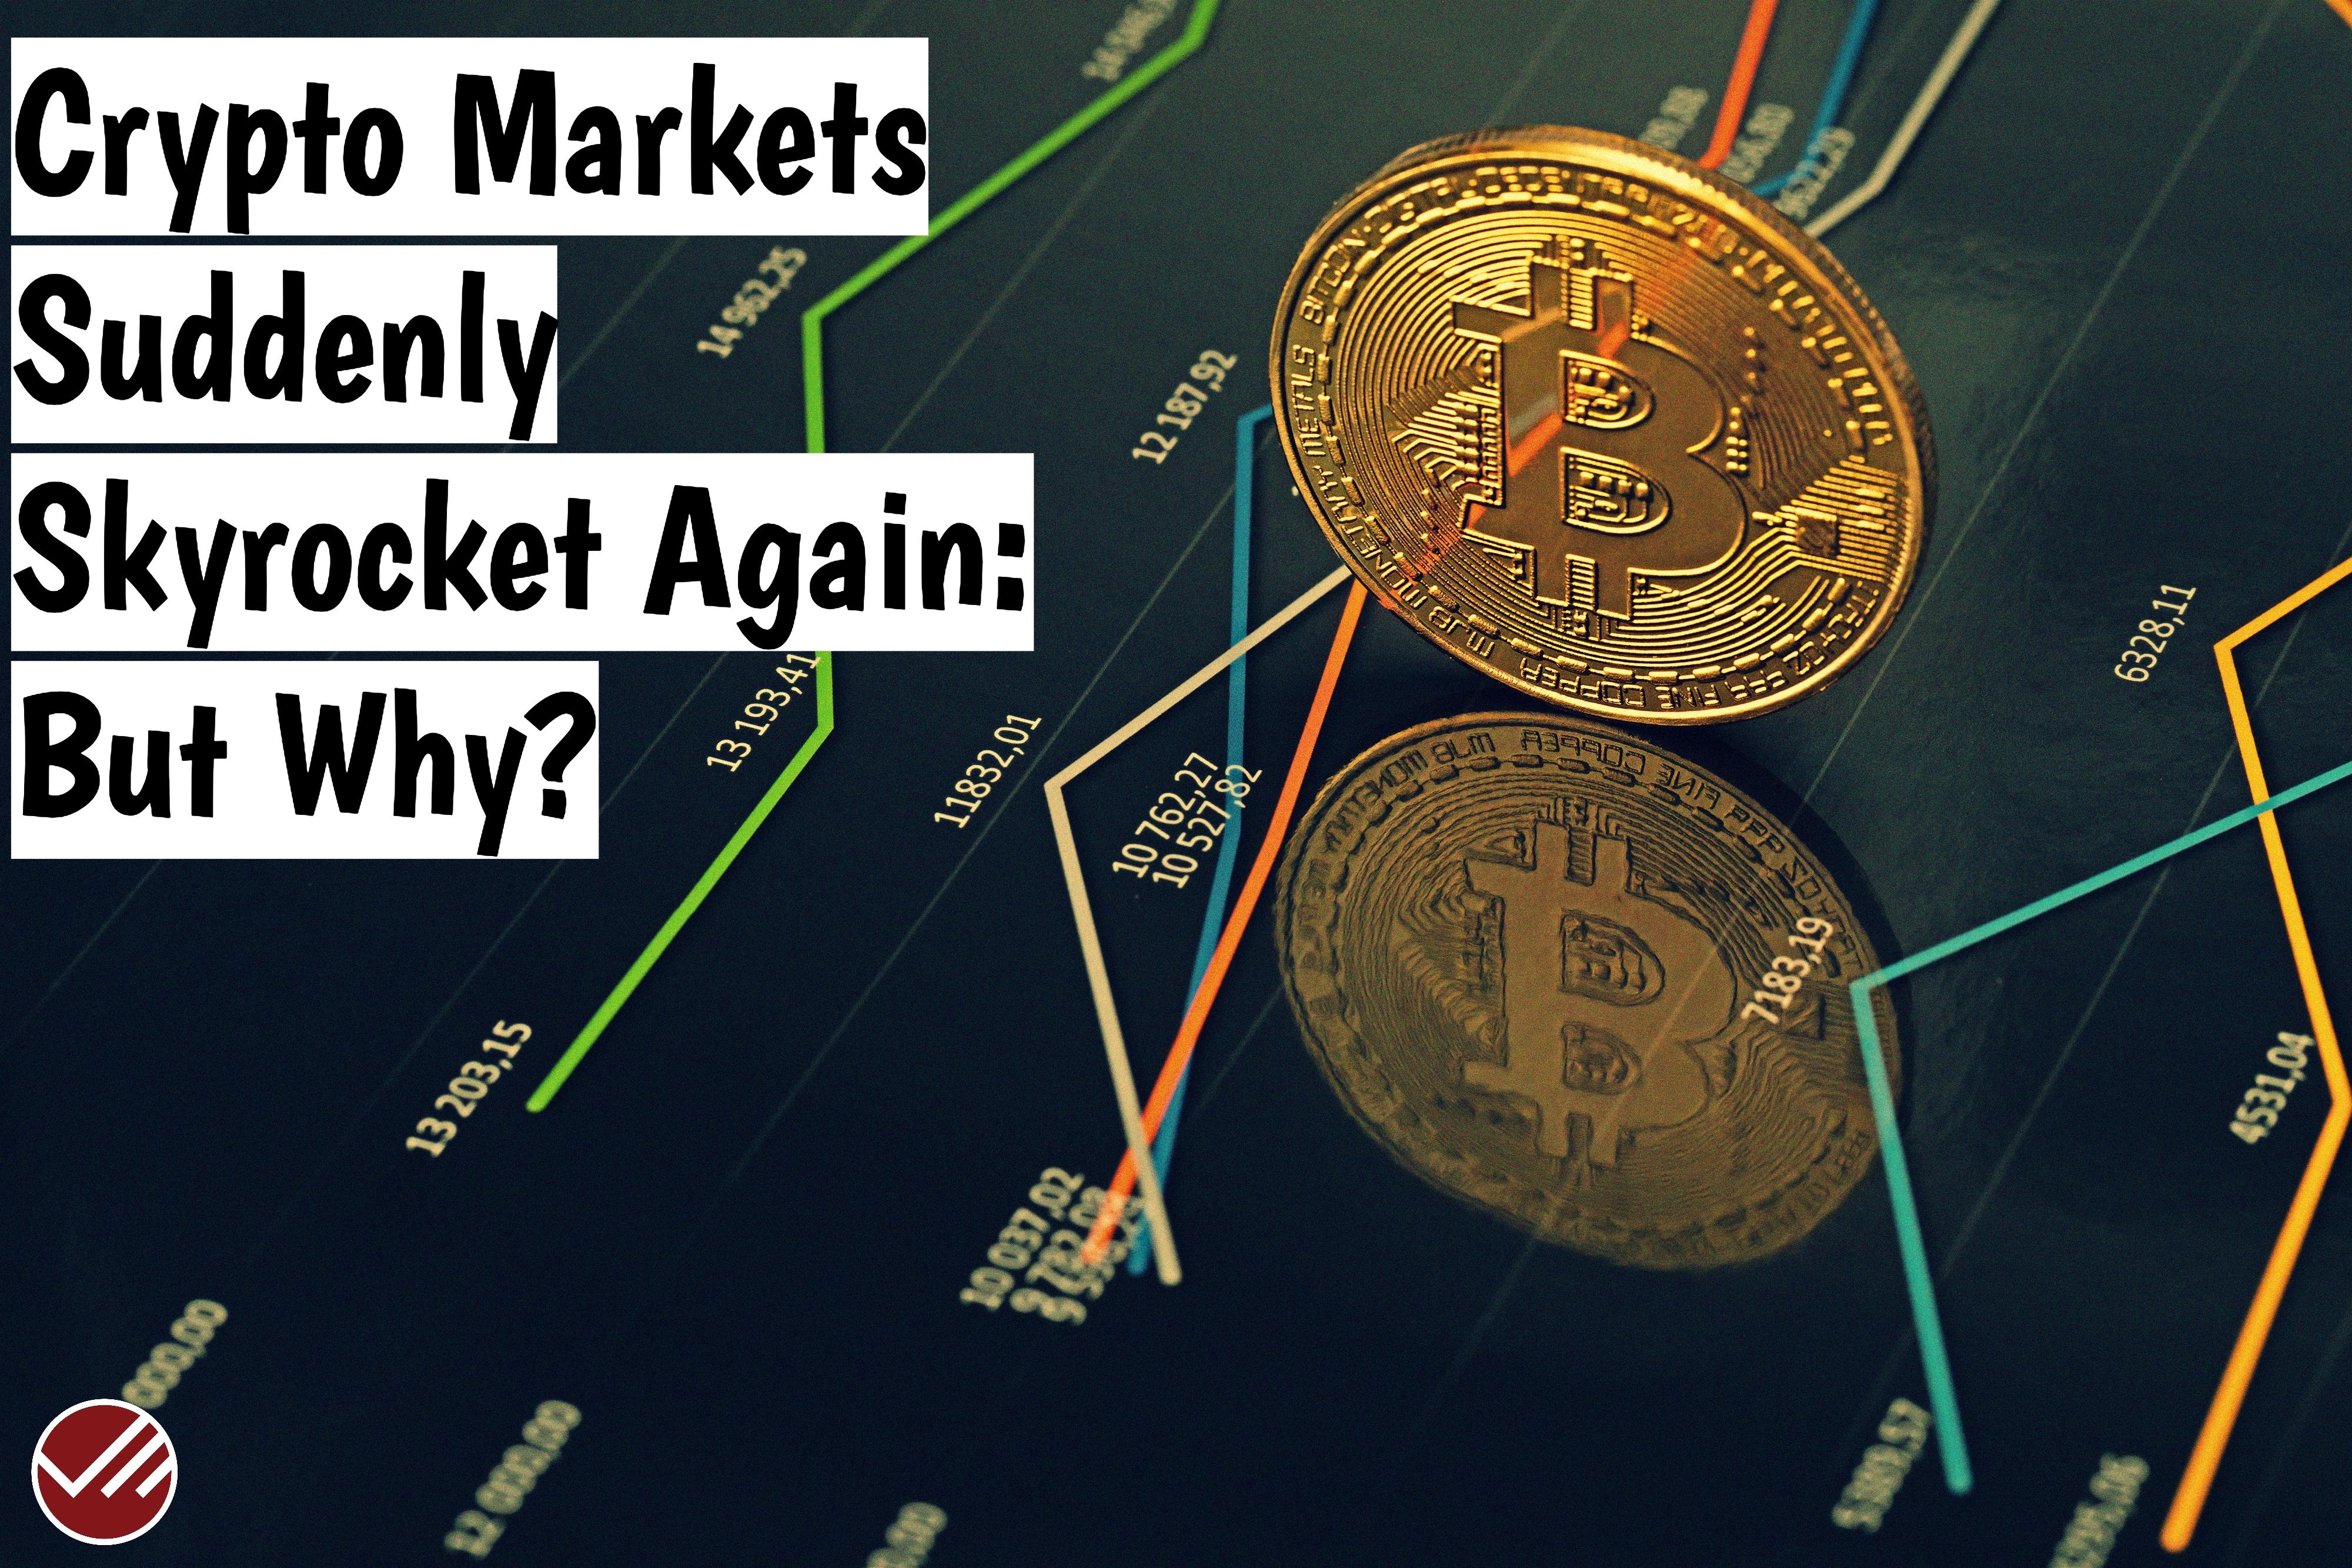 Crypto Markets Suddenly Skyrocket Again: But Why?